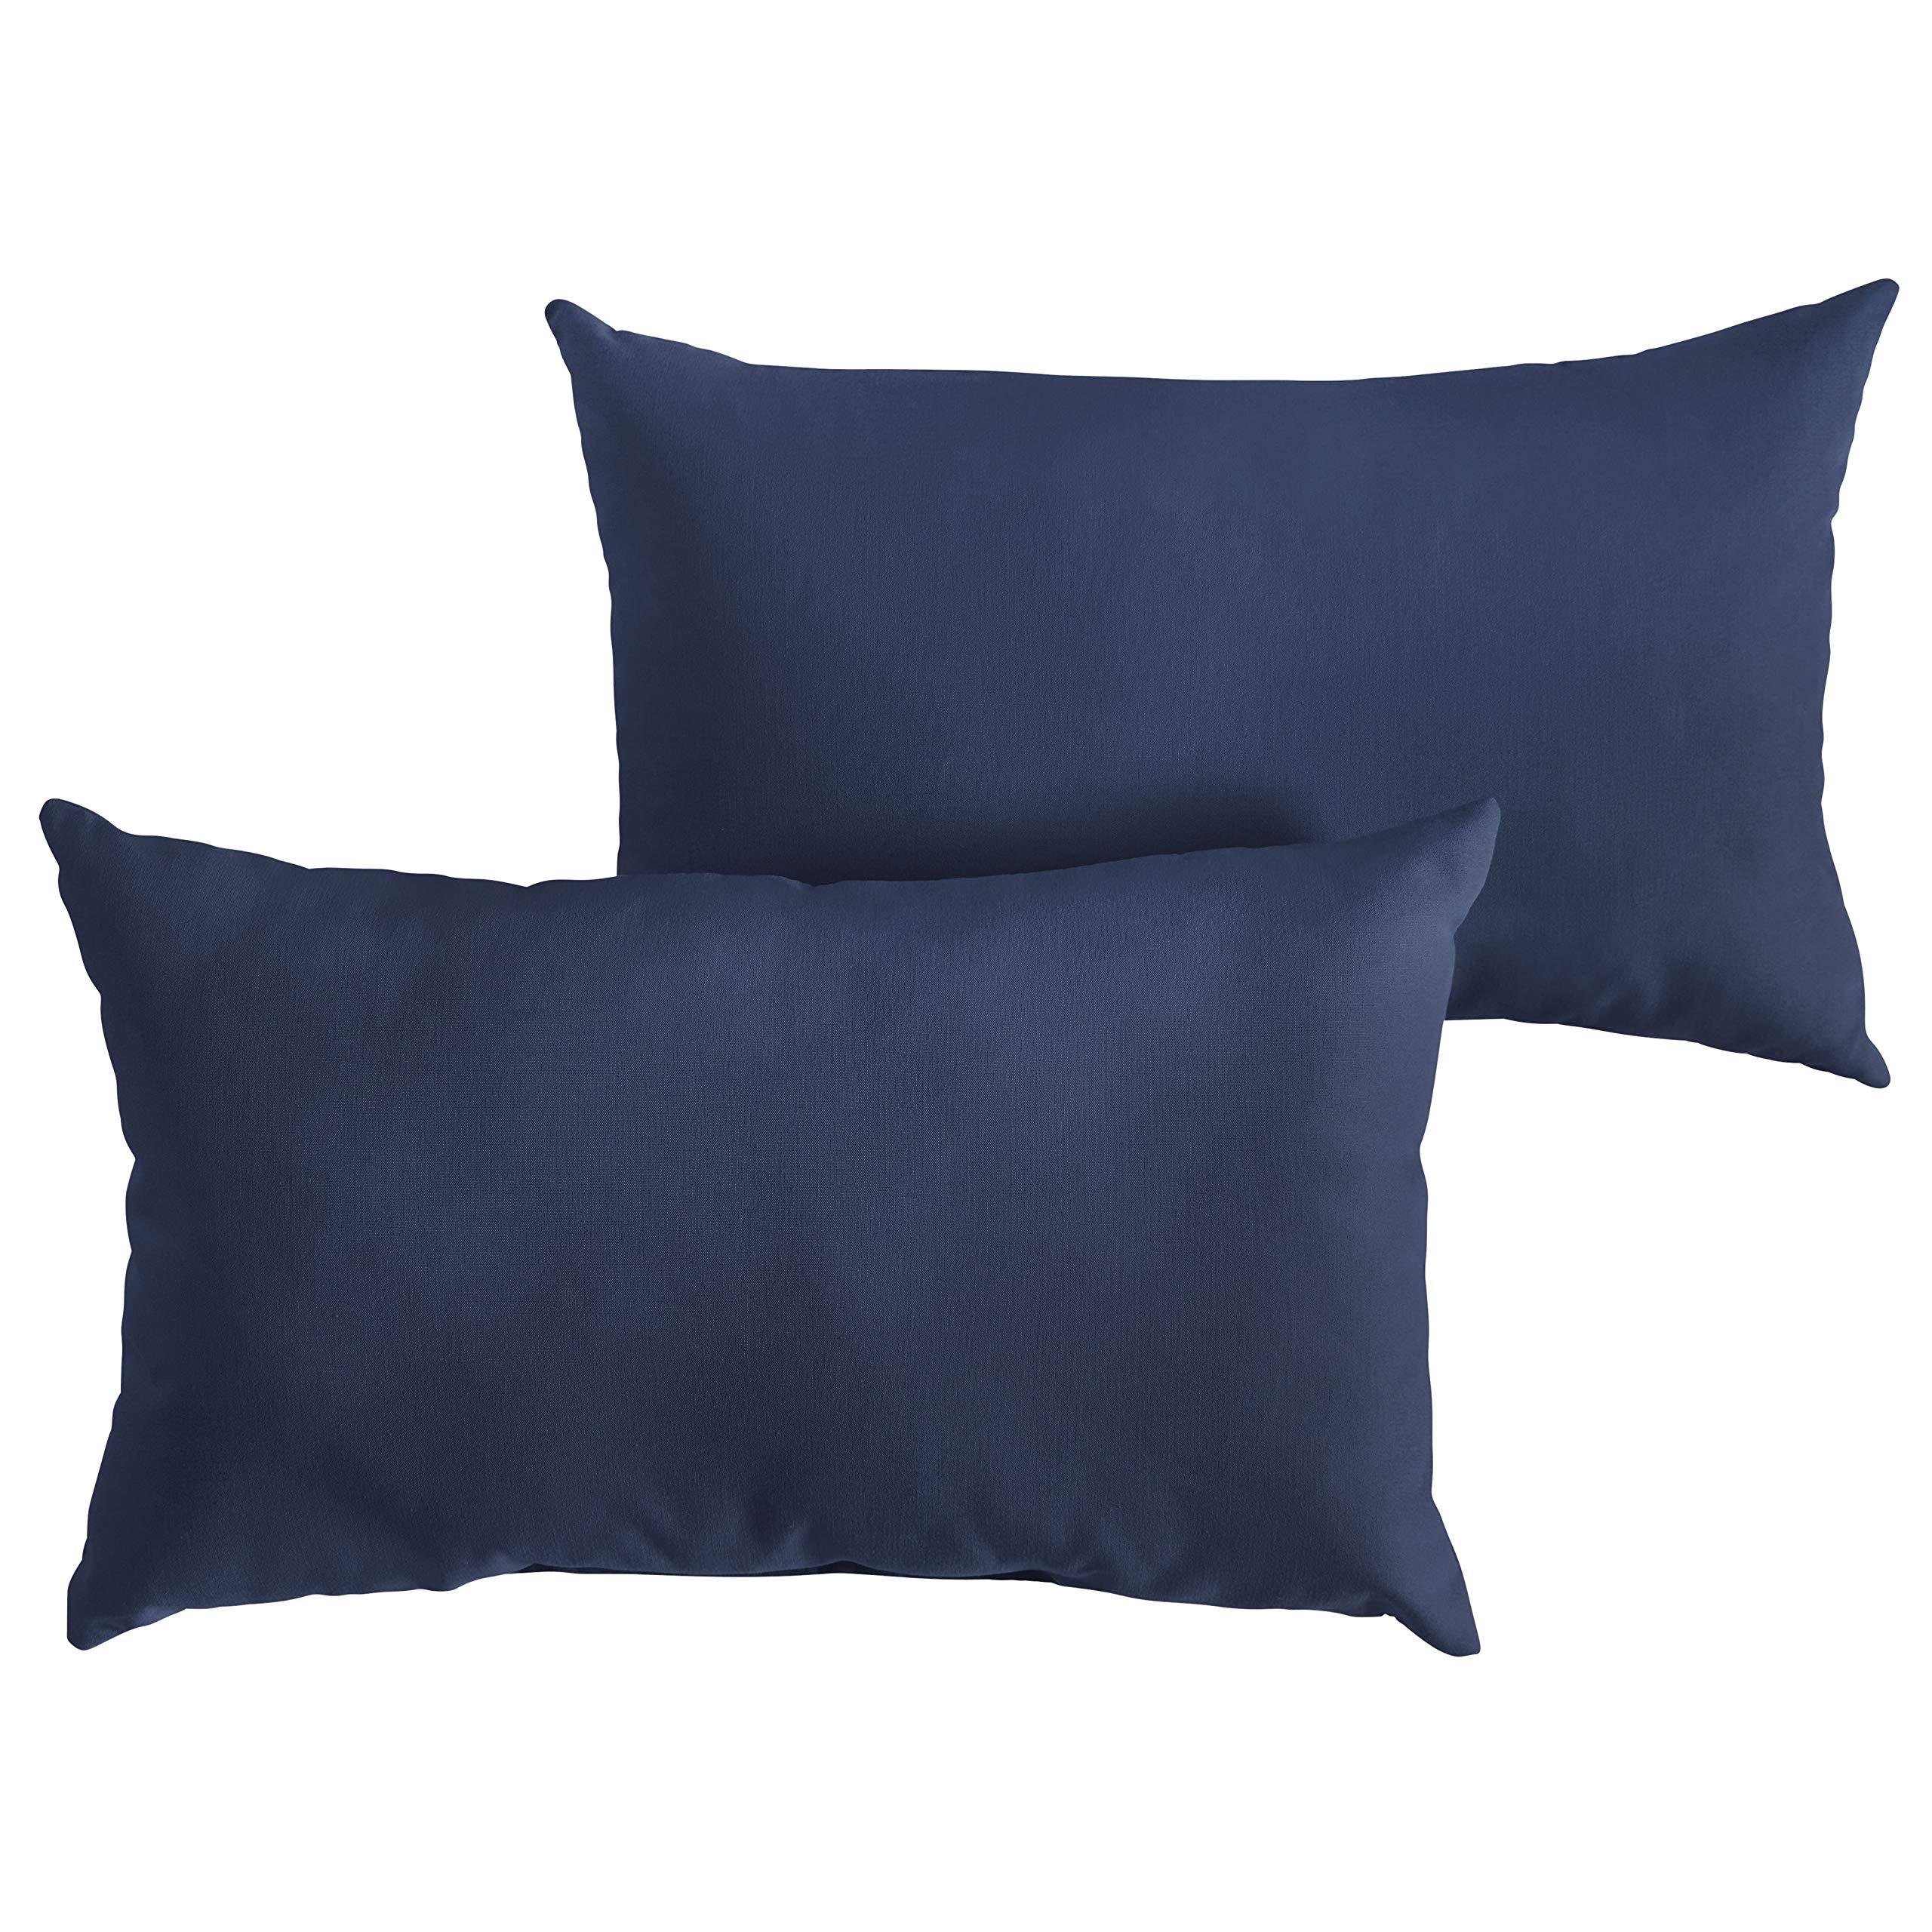 1101Design Sunbrella Canvas Navy Knife Edge Decorative Indoor/Outdoor Rectangle Lumbar Pillow, Perfect for Patio Decor - Canvas Navy Blue 14'' x 24'' (Set of 2)